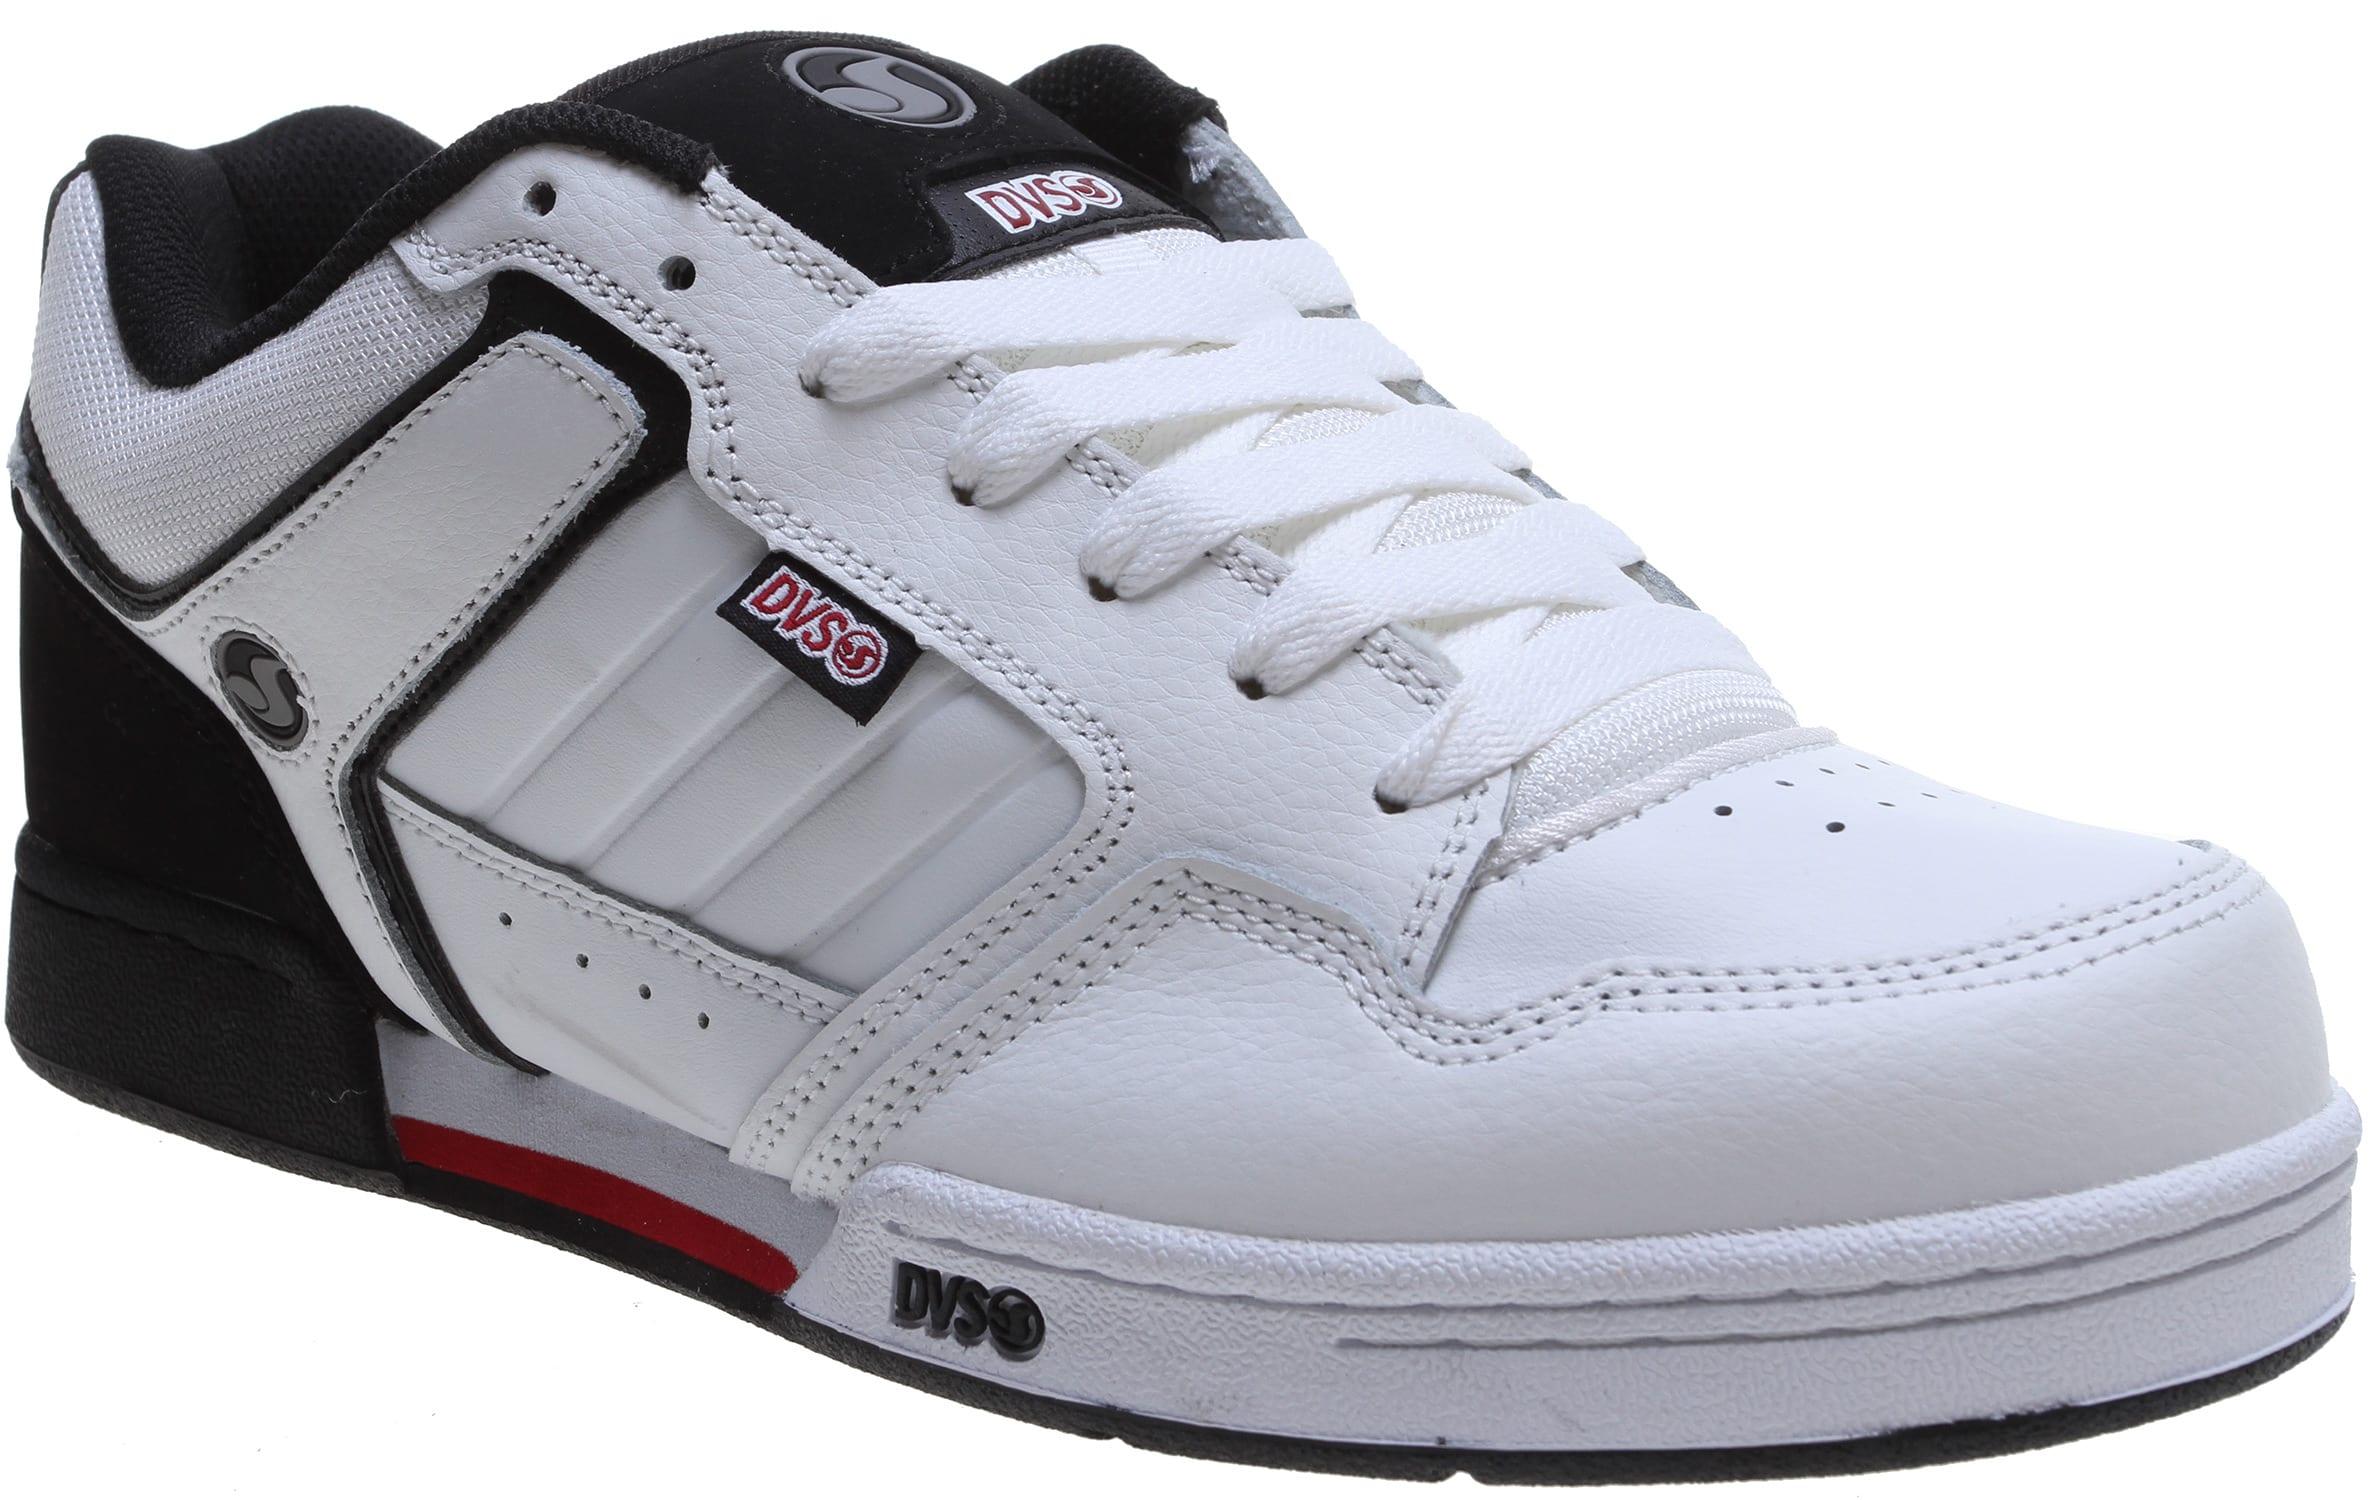 ef036beebc6 DVS Transom Skate Shoes - thumbnail 2